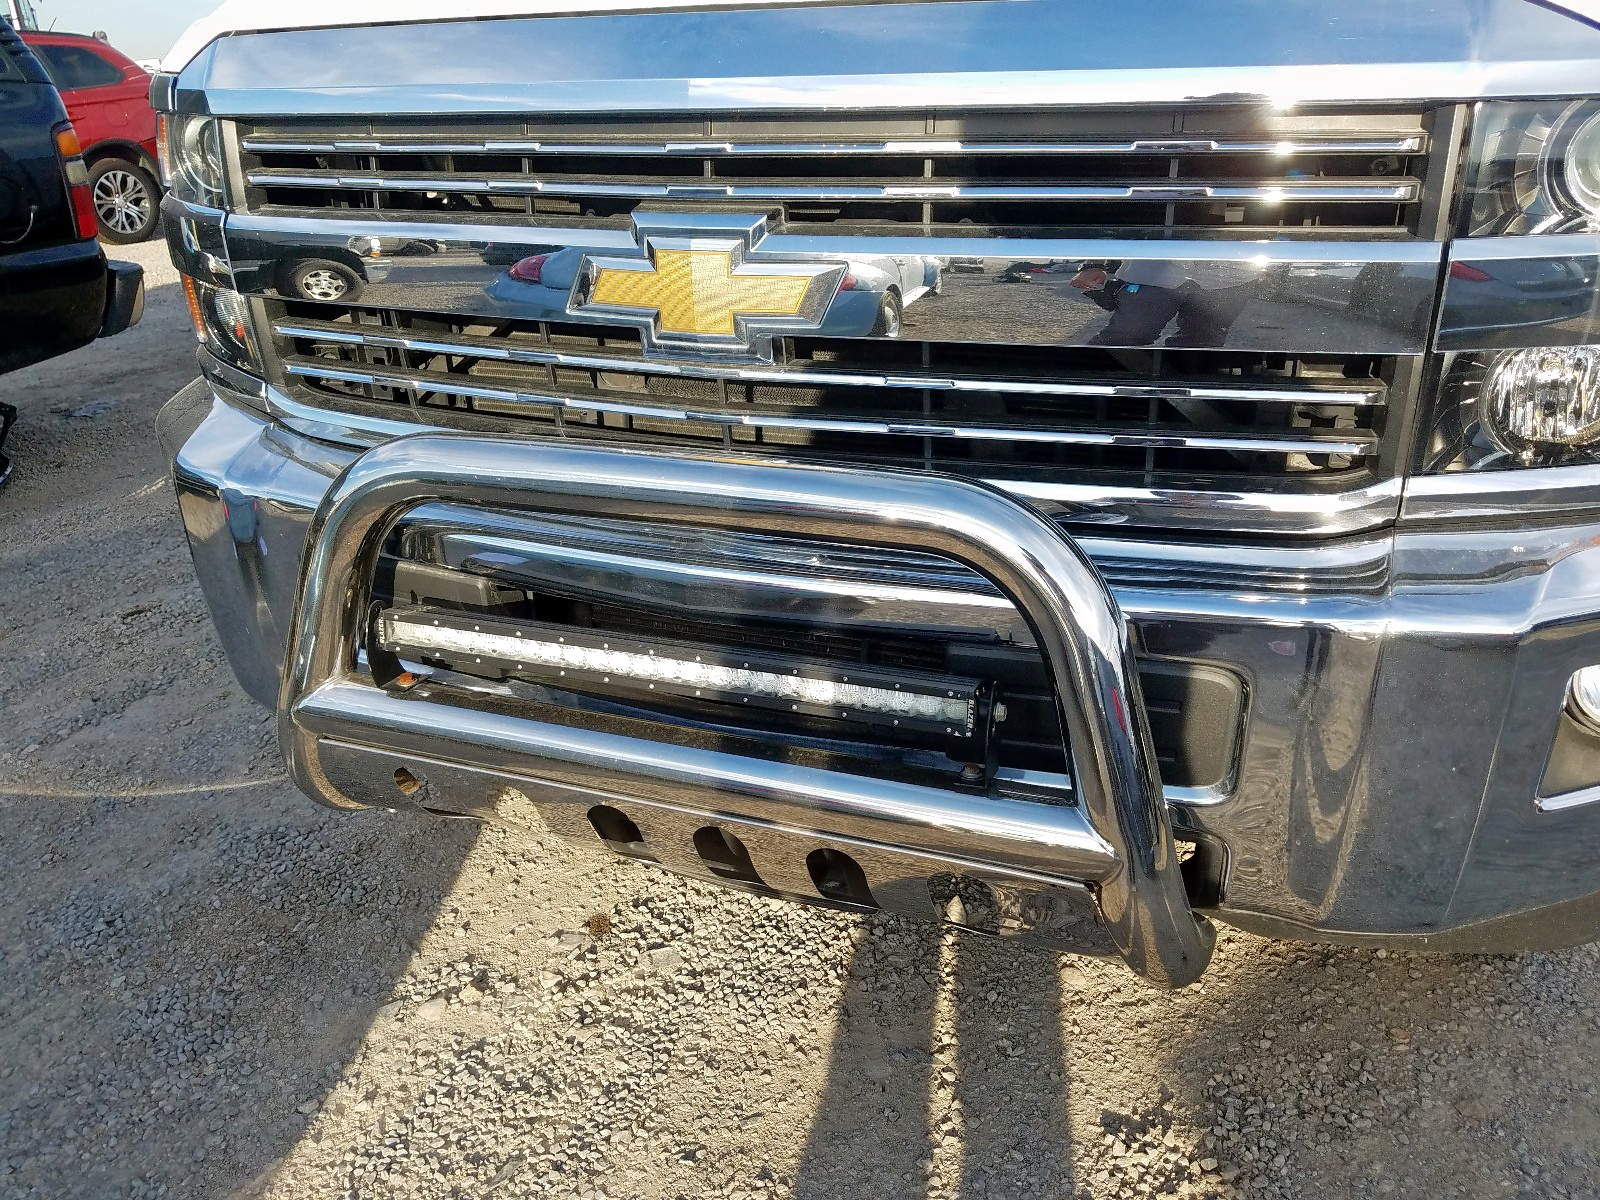 1GC1CVEG1GF279626 - 2016 Chevrolet Silverado 6.0L engine view